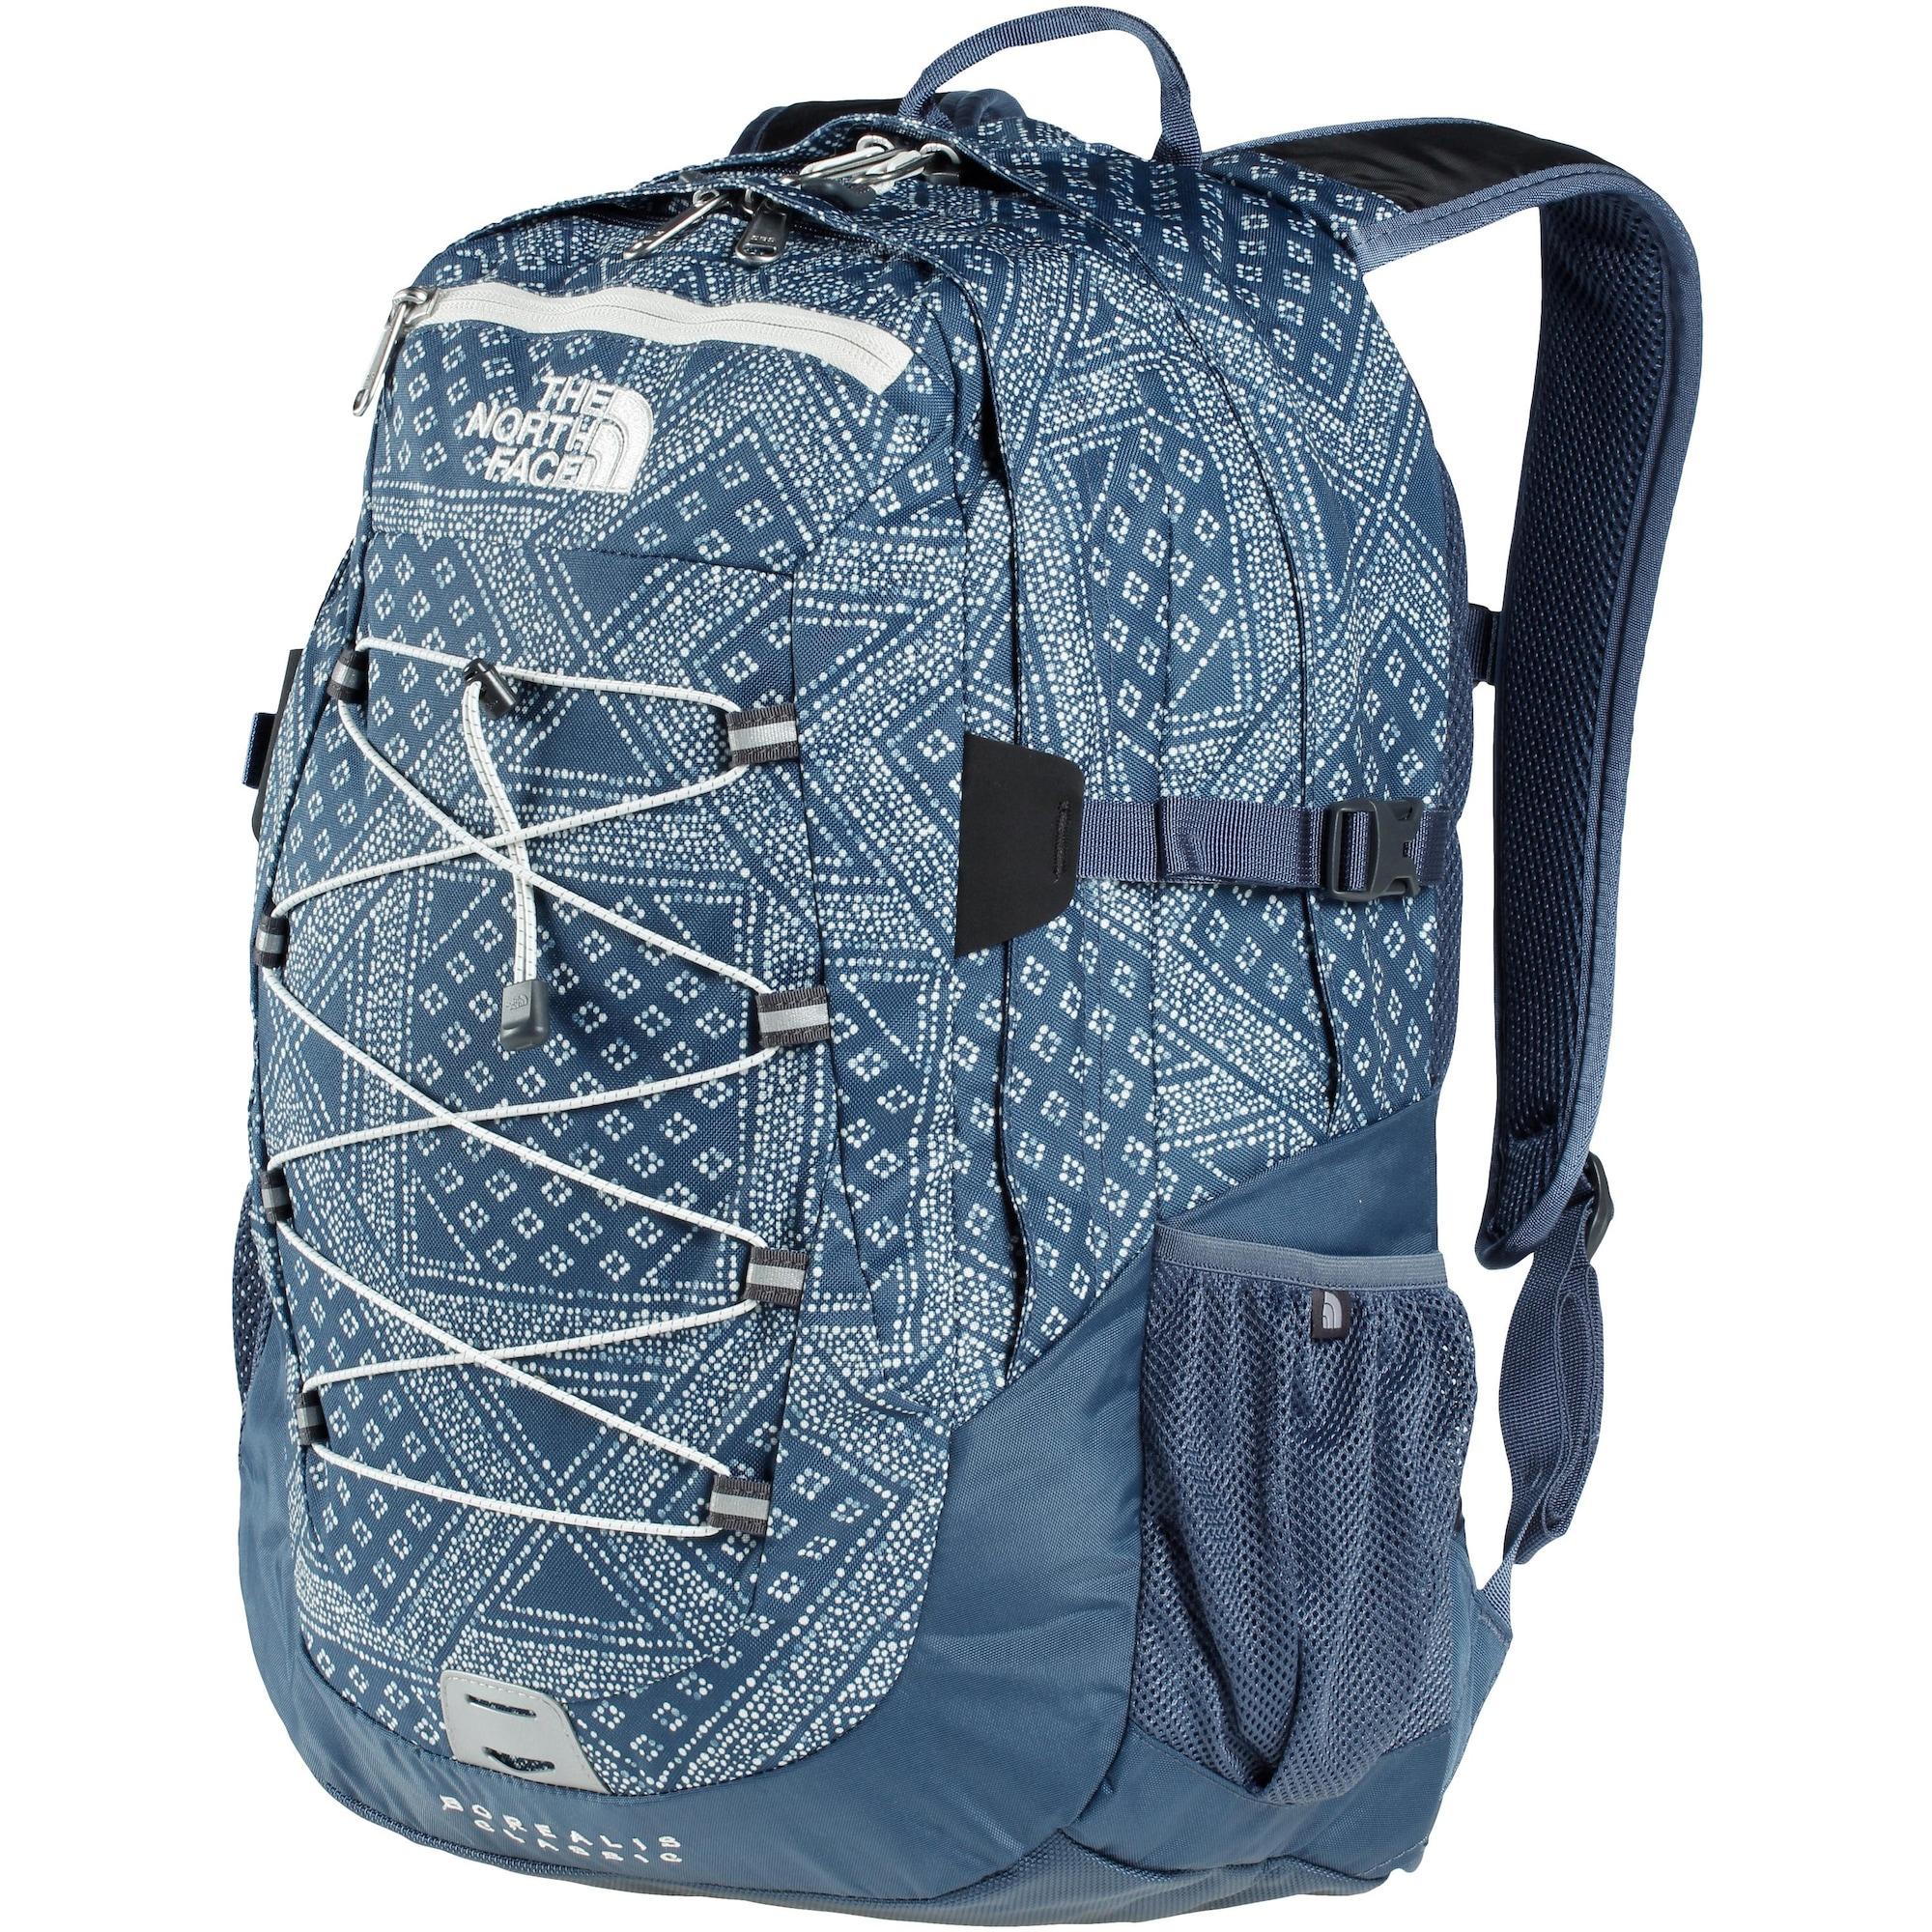 Daypack 'Borealis Classic'   Taschen > Rucksäcke > Tourenrucksäcke   The North Face